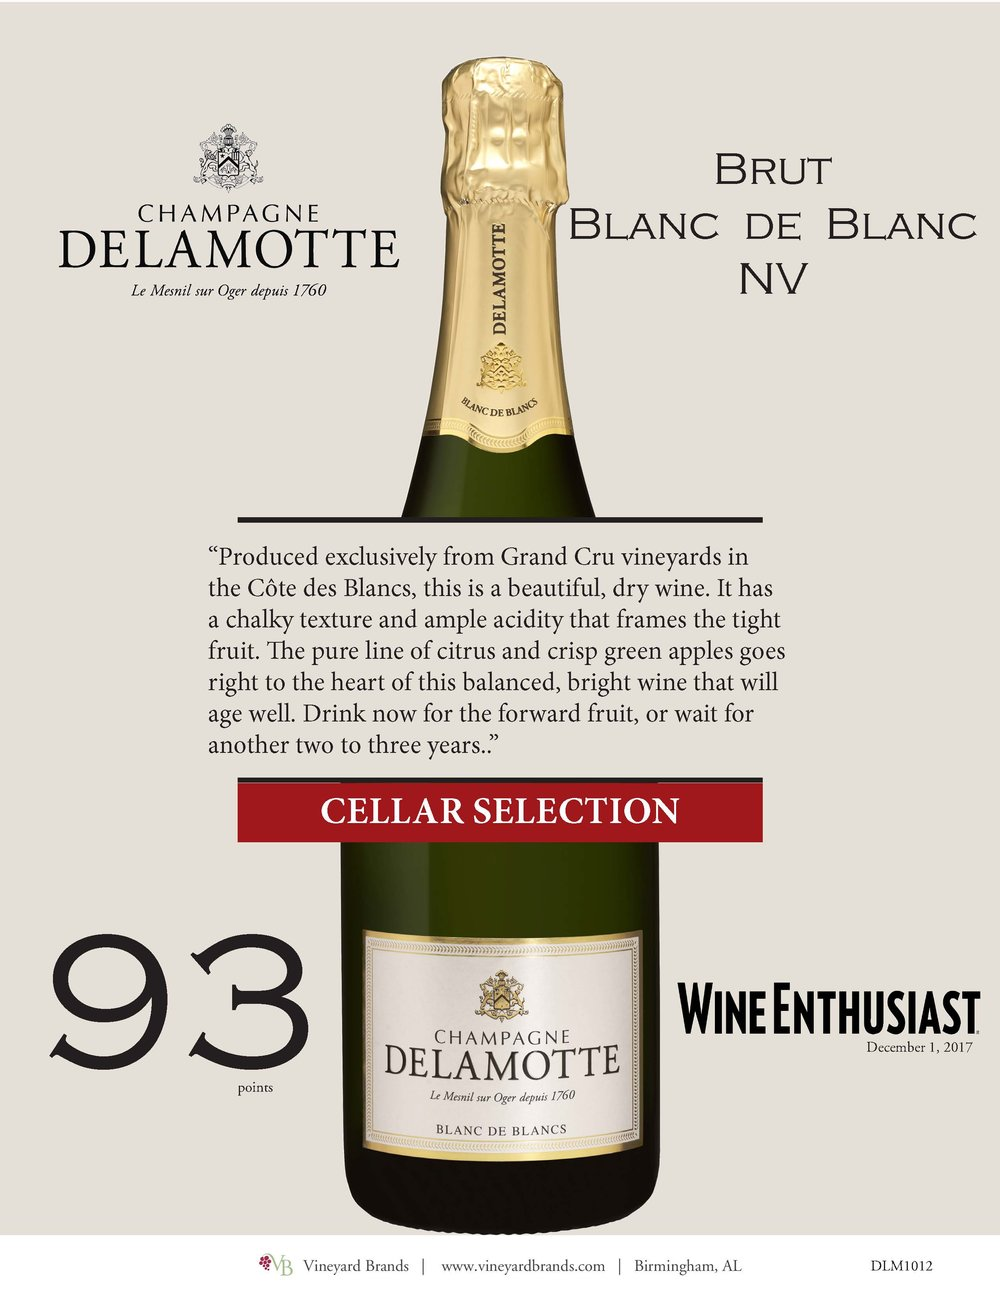 Champagne Delamotte Brut Blanc de Blanc NV.jpg